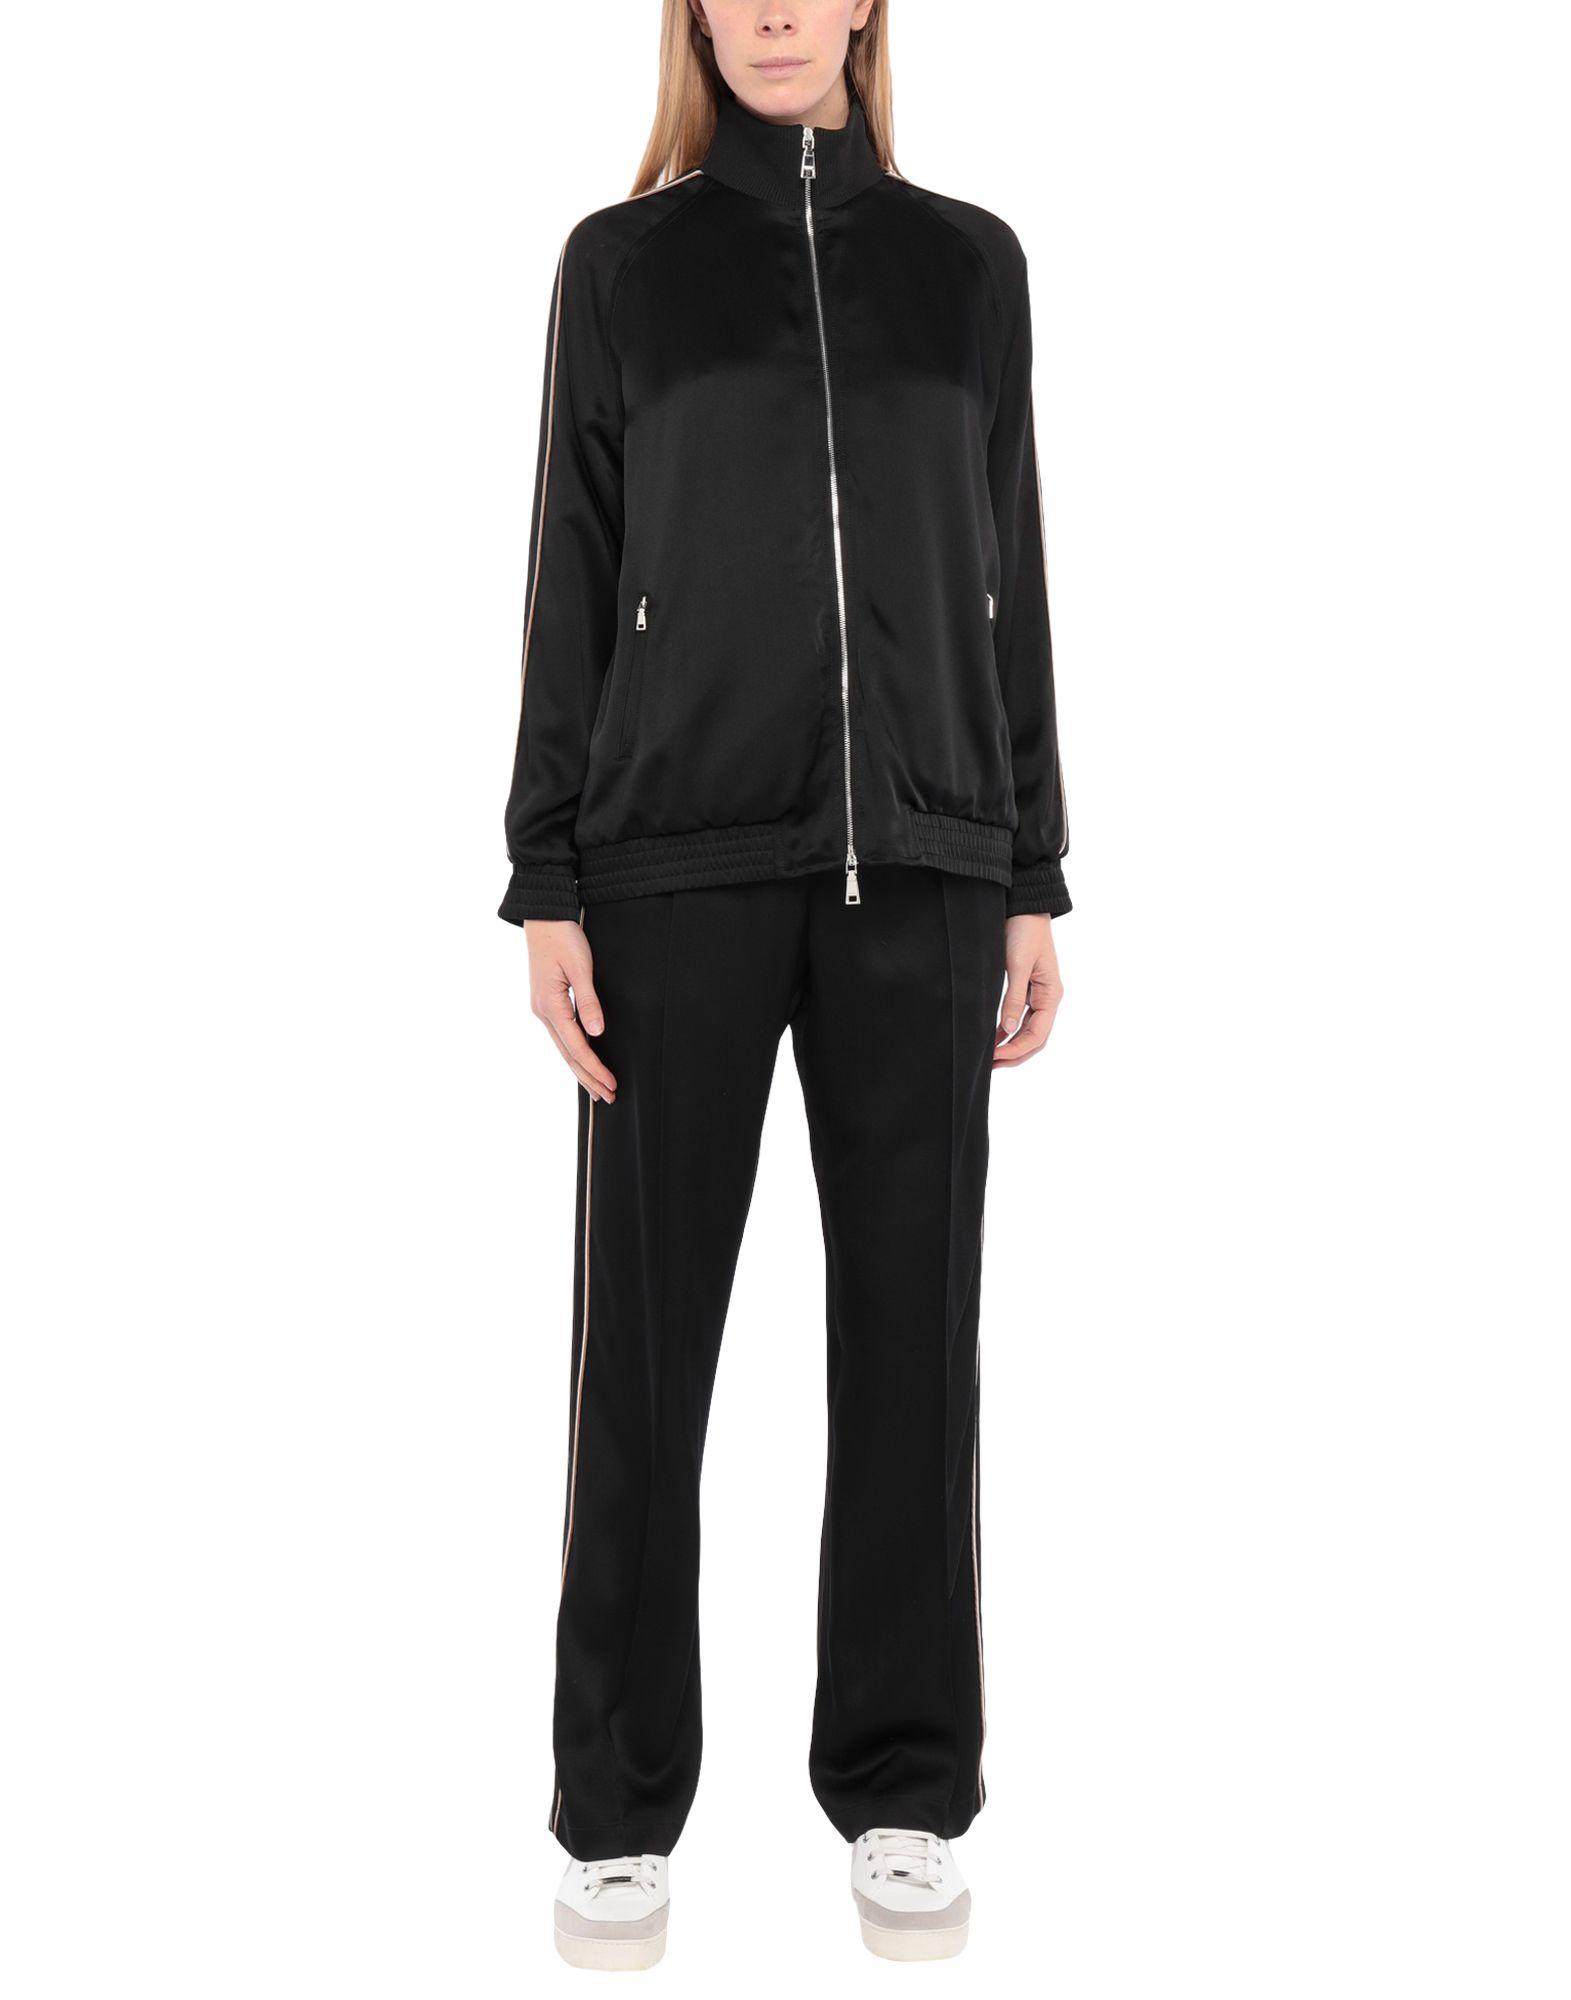 SEVENTY SERGIO TEGON 10 COLLECTION Спортивный костюм versace collection спортивный костюм